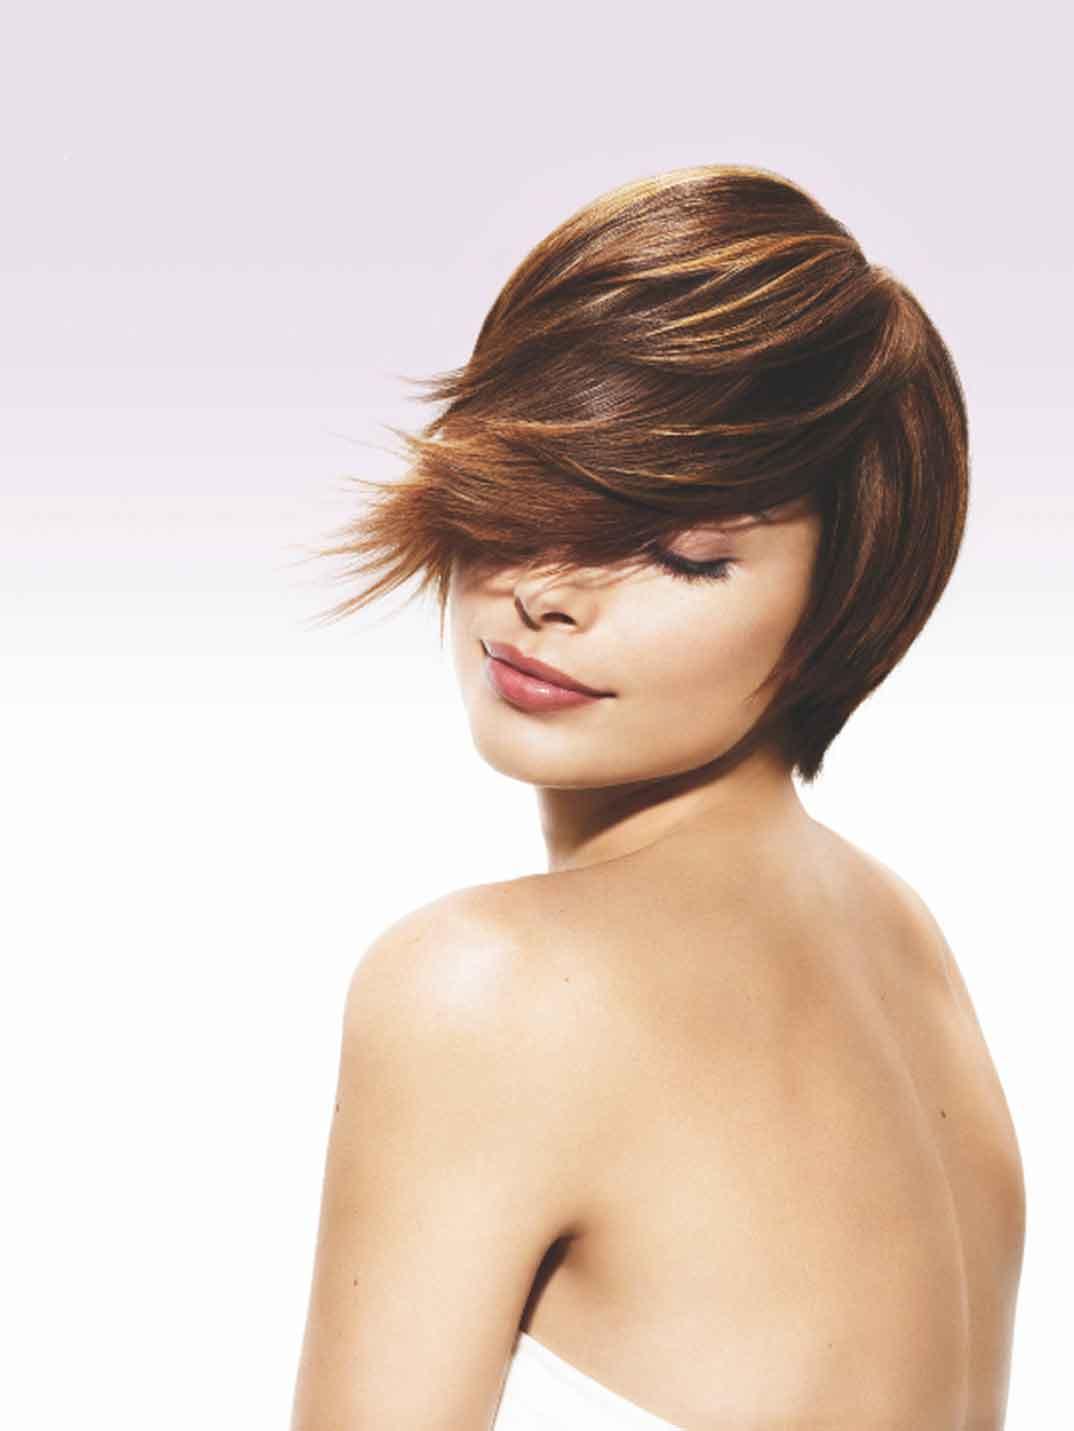 Corte Carré - Peinados que rejuvenecen